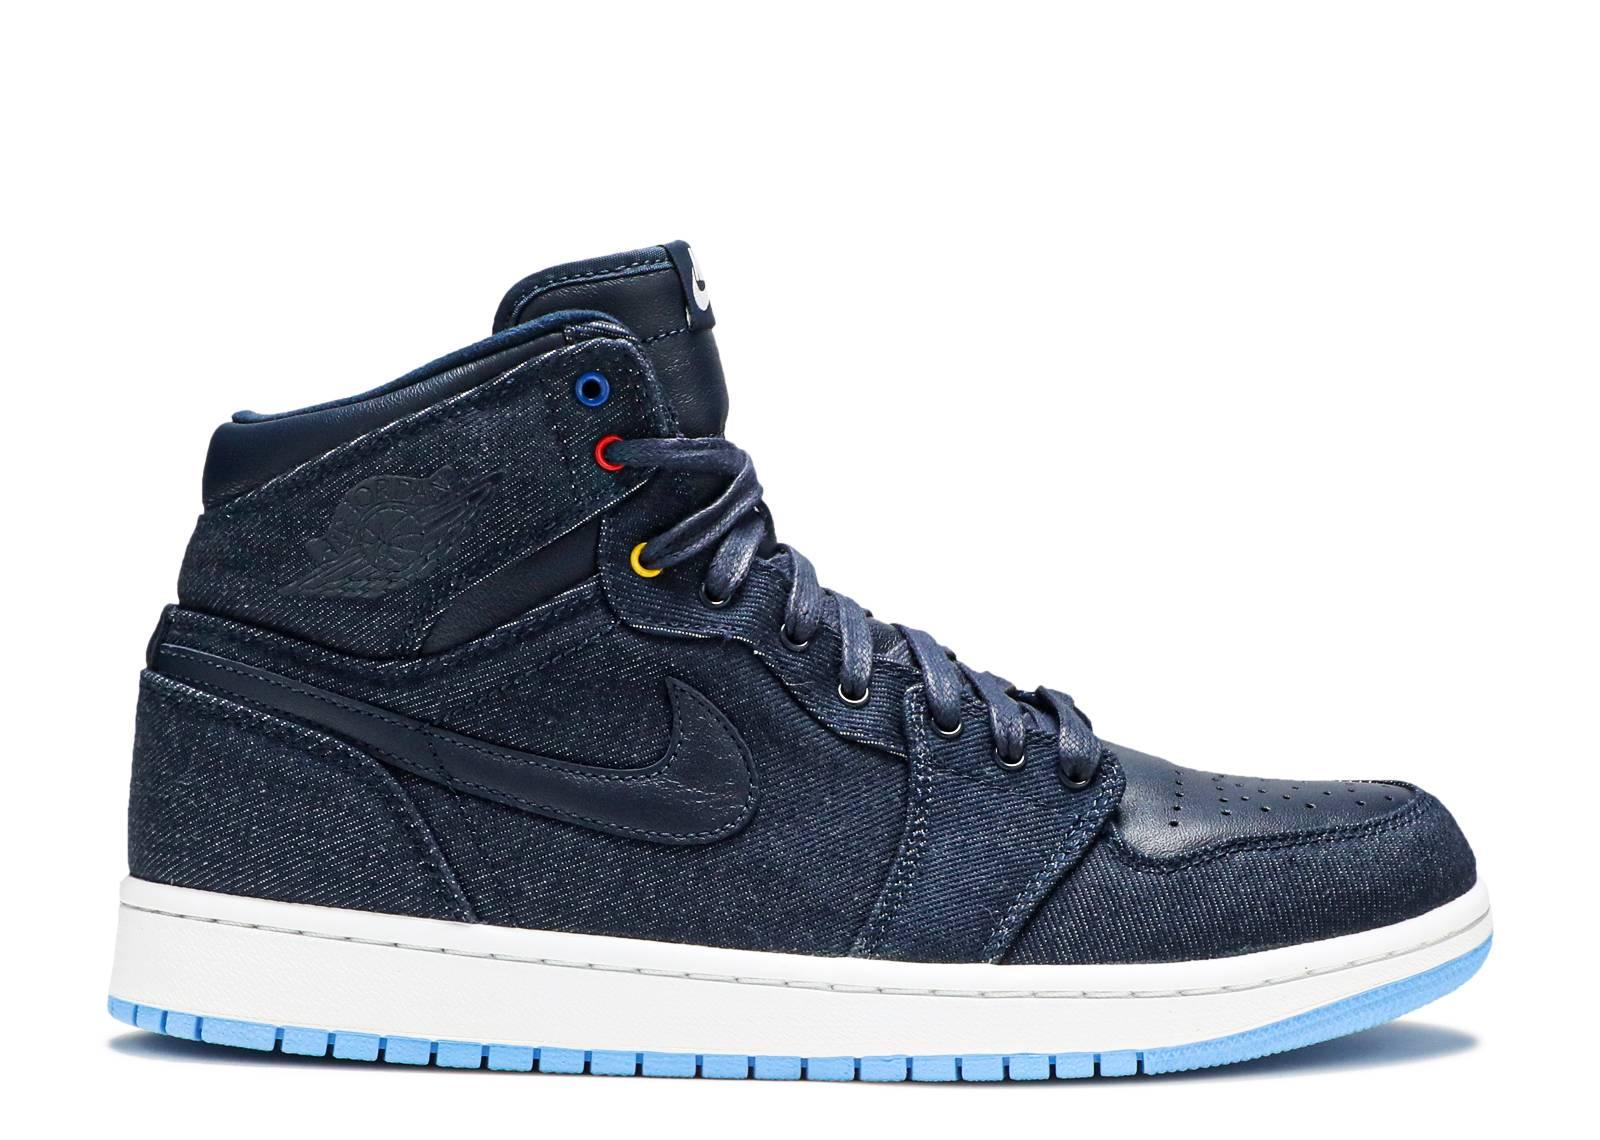 on sale be279 eedc0 Air Jordan 1 Retro High